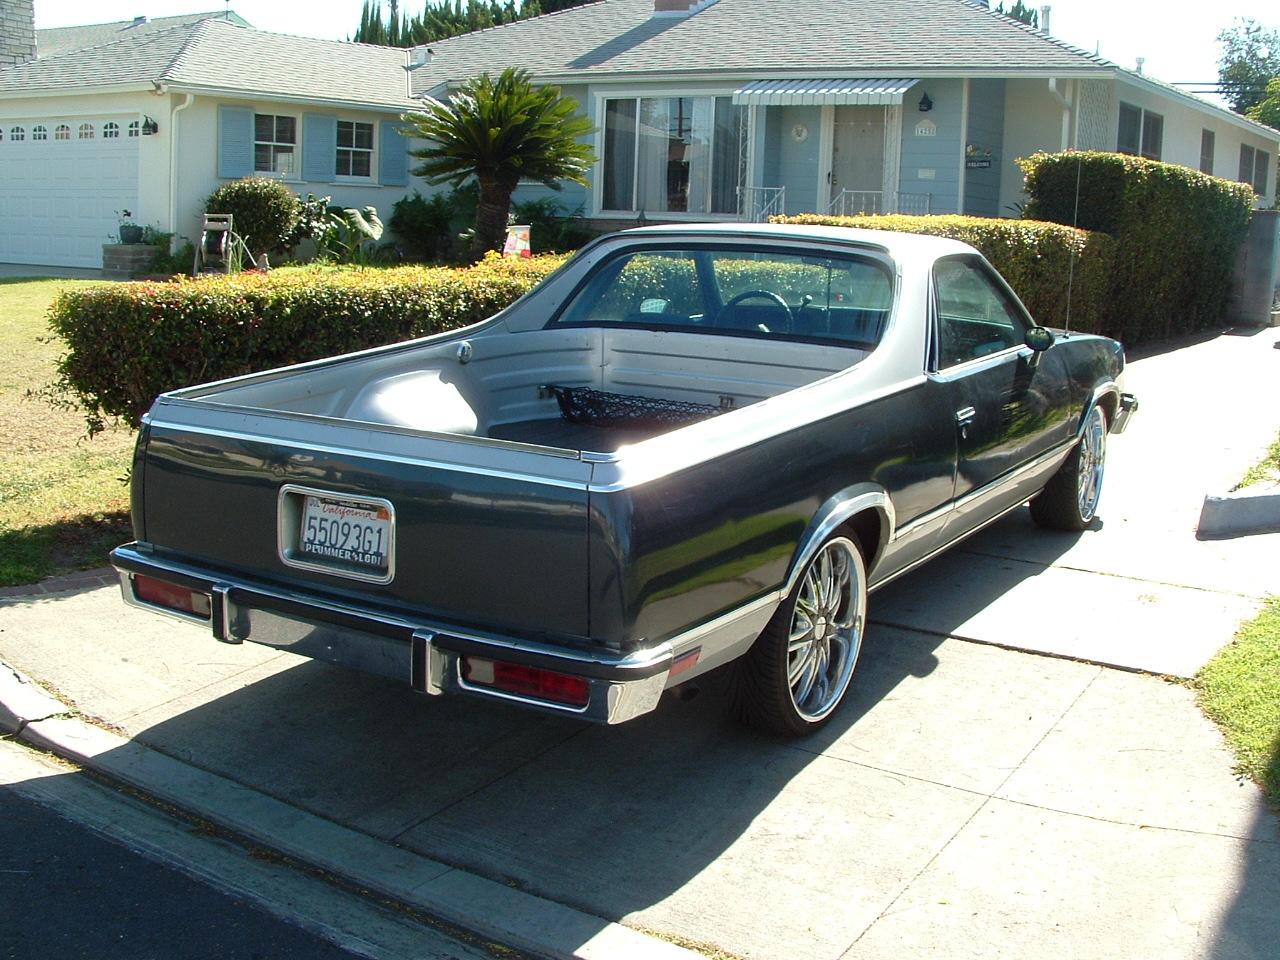 1985 Chevrolet El Camino - Overview - CarGurus